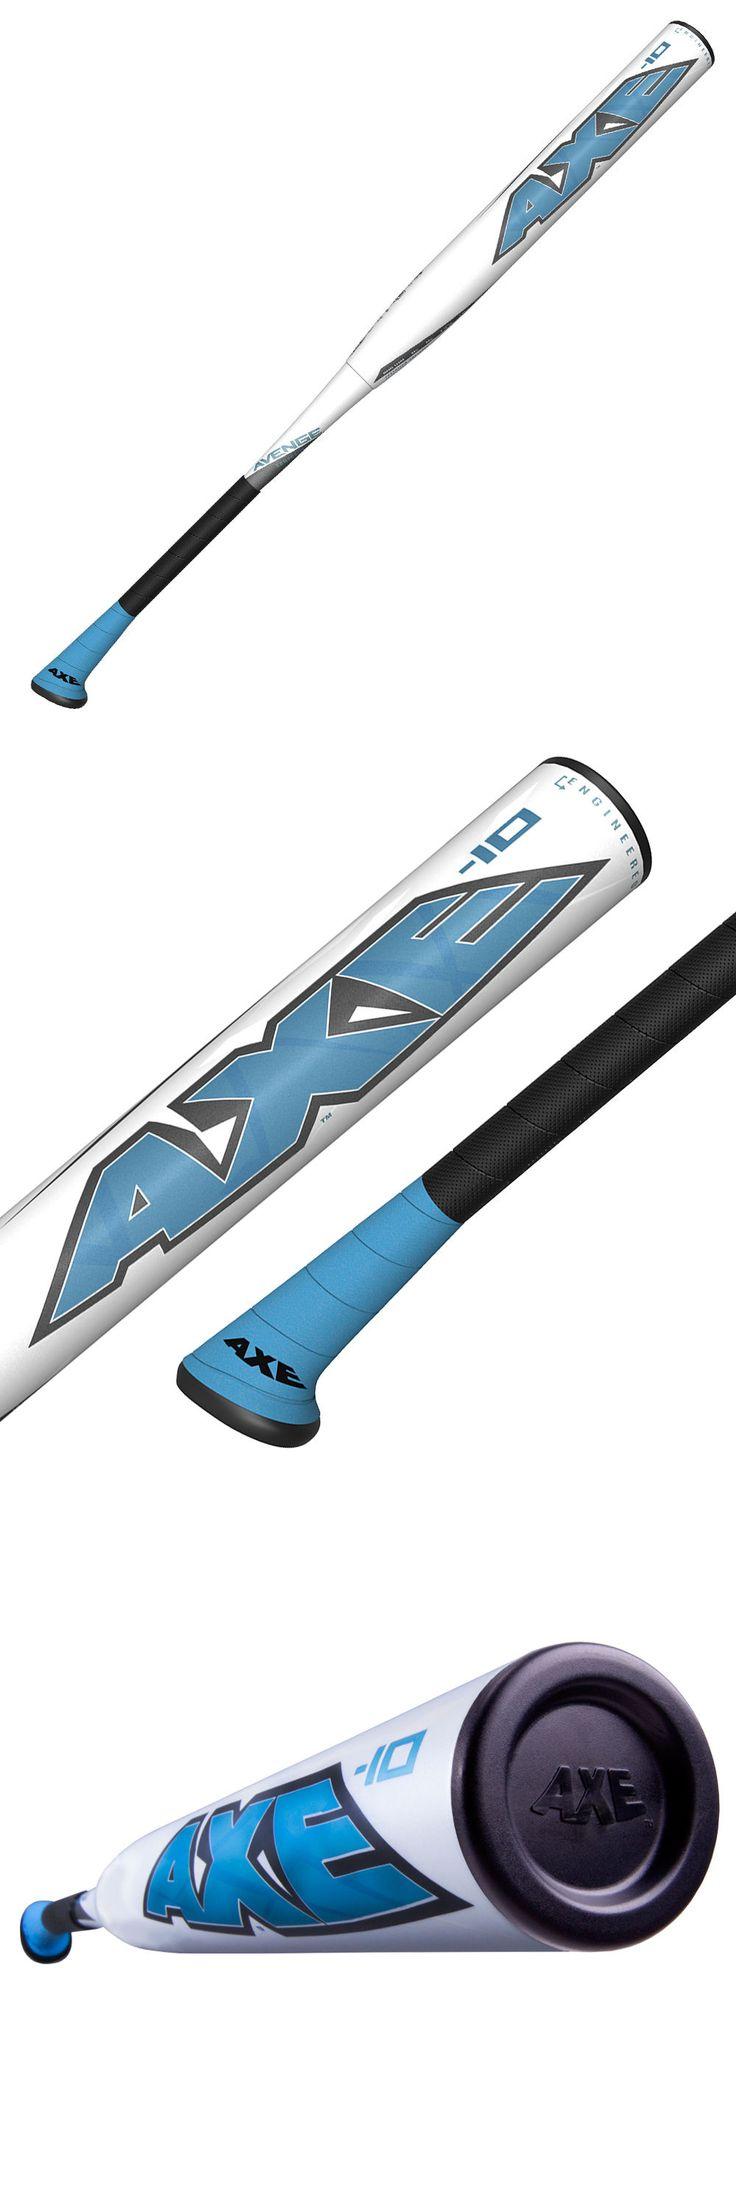 Softball-Fastpitch 71089: 2014 Axe Bat L150a Avenge Fast-Pitch Softball Bat -10 (31 21) -> BUY IT NOW ONLY: $140 on eBay!